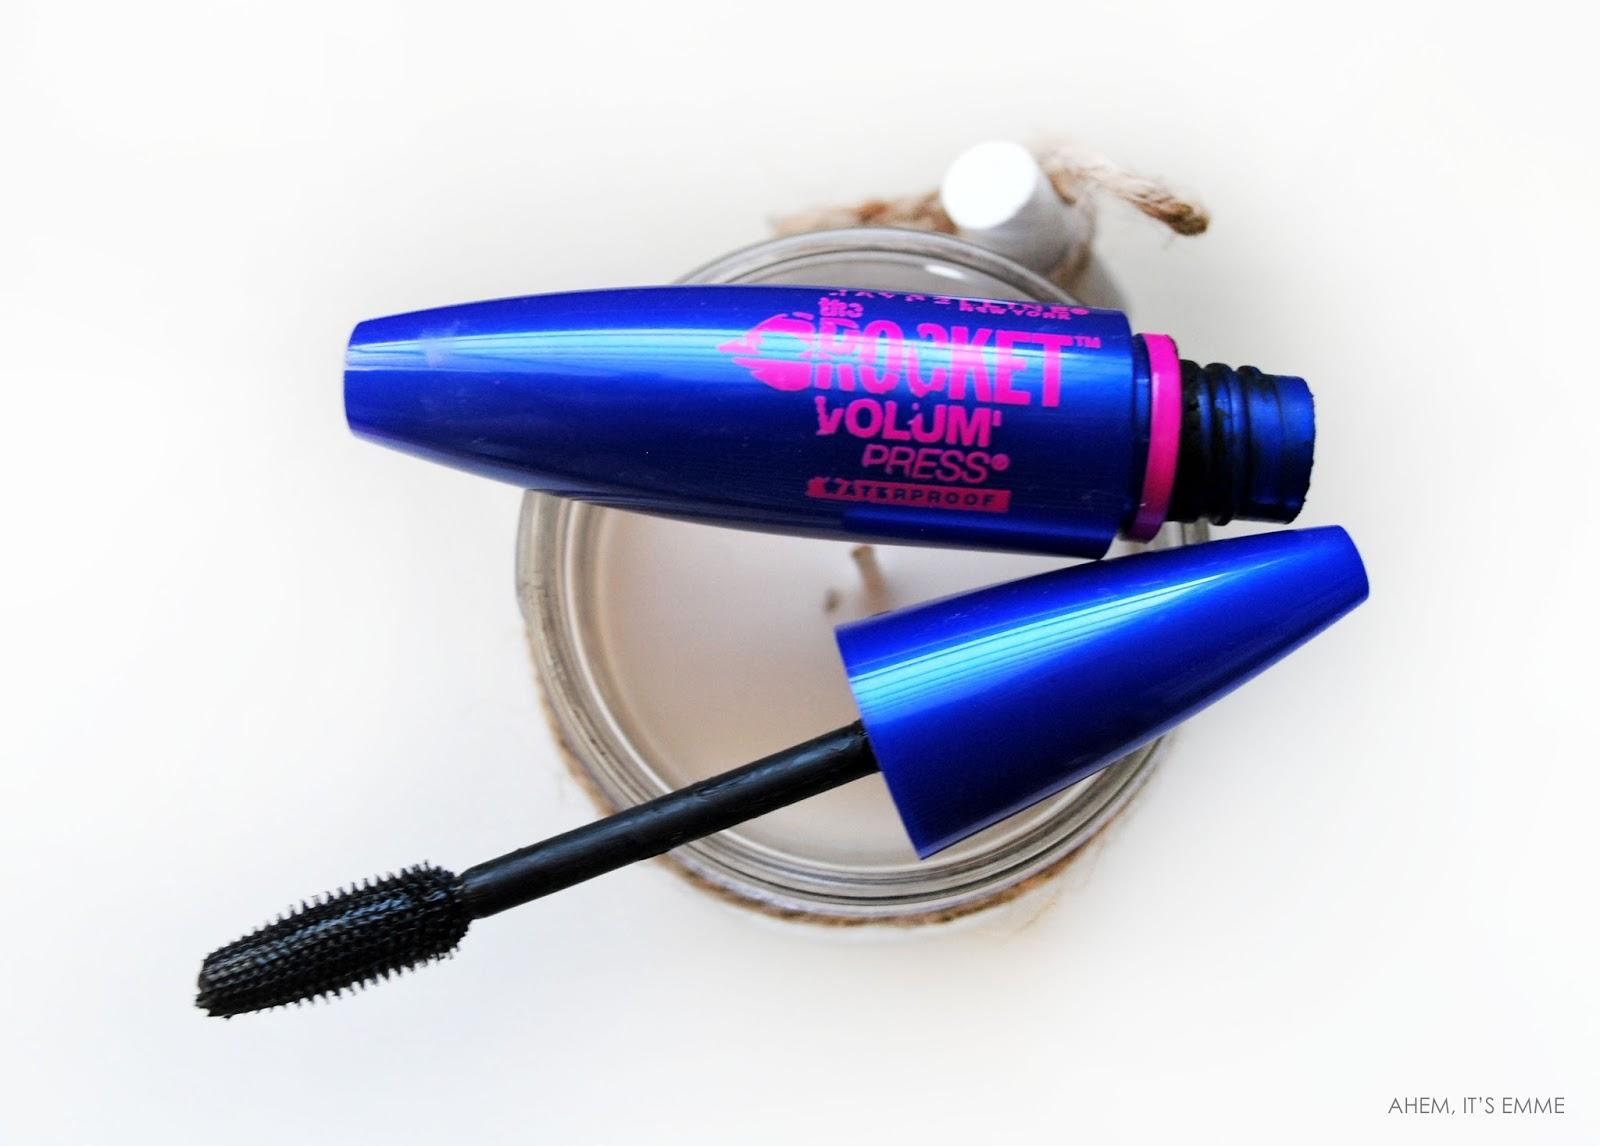 Mascara Meybelin rocket. Feedback on advantages and disadvantages